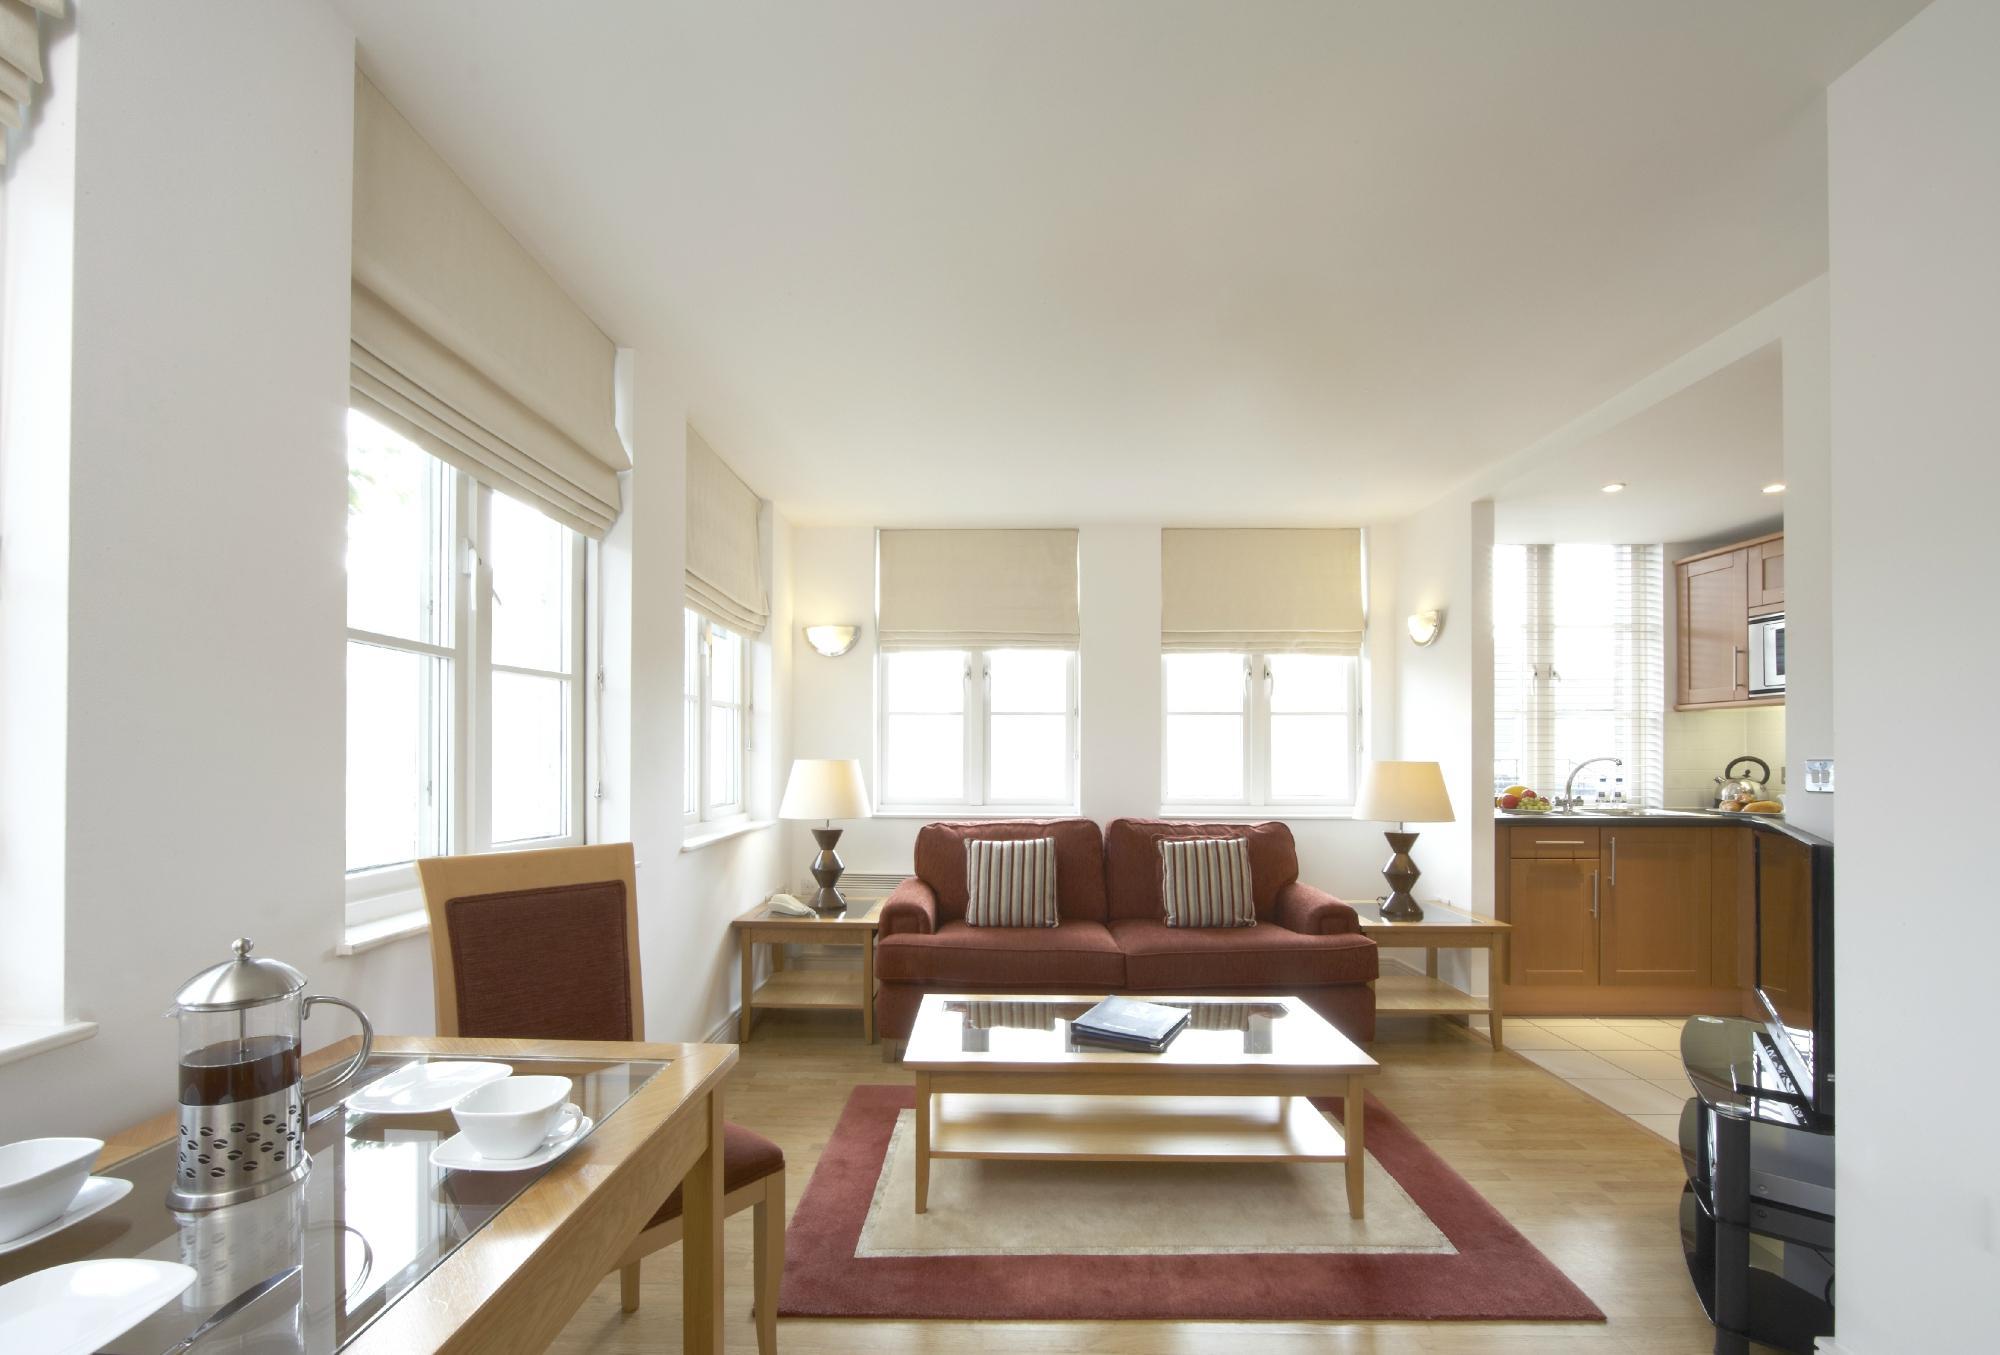 marlin apartments queen street londres royaume uni